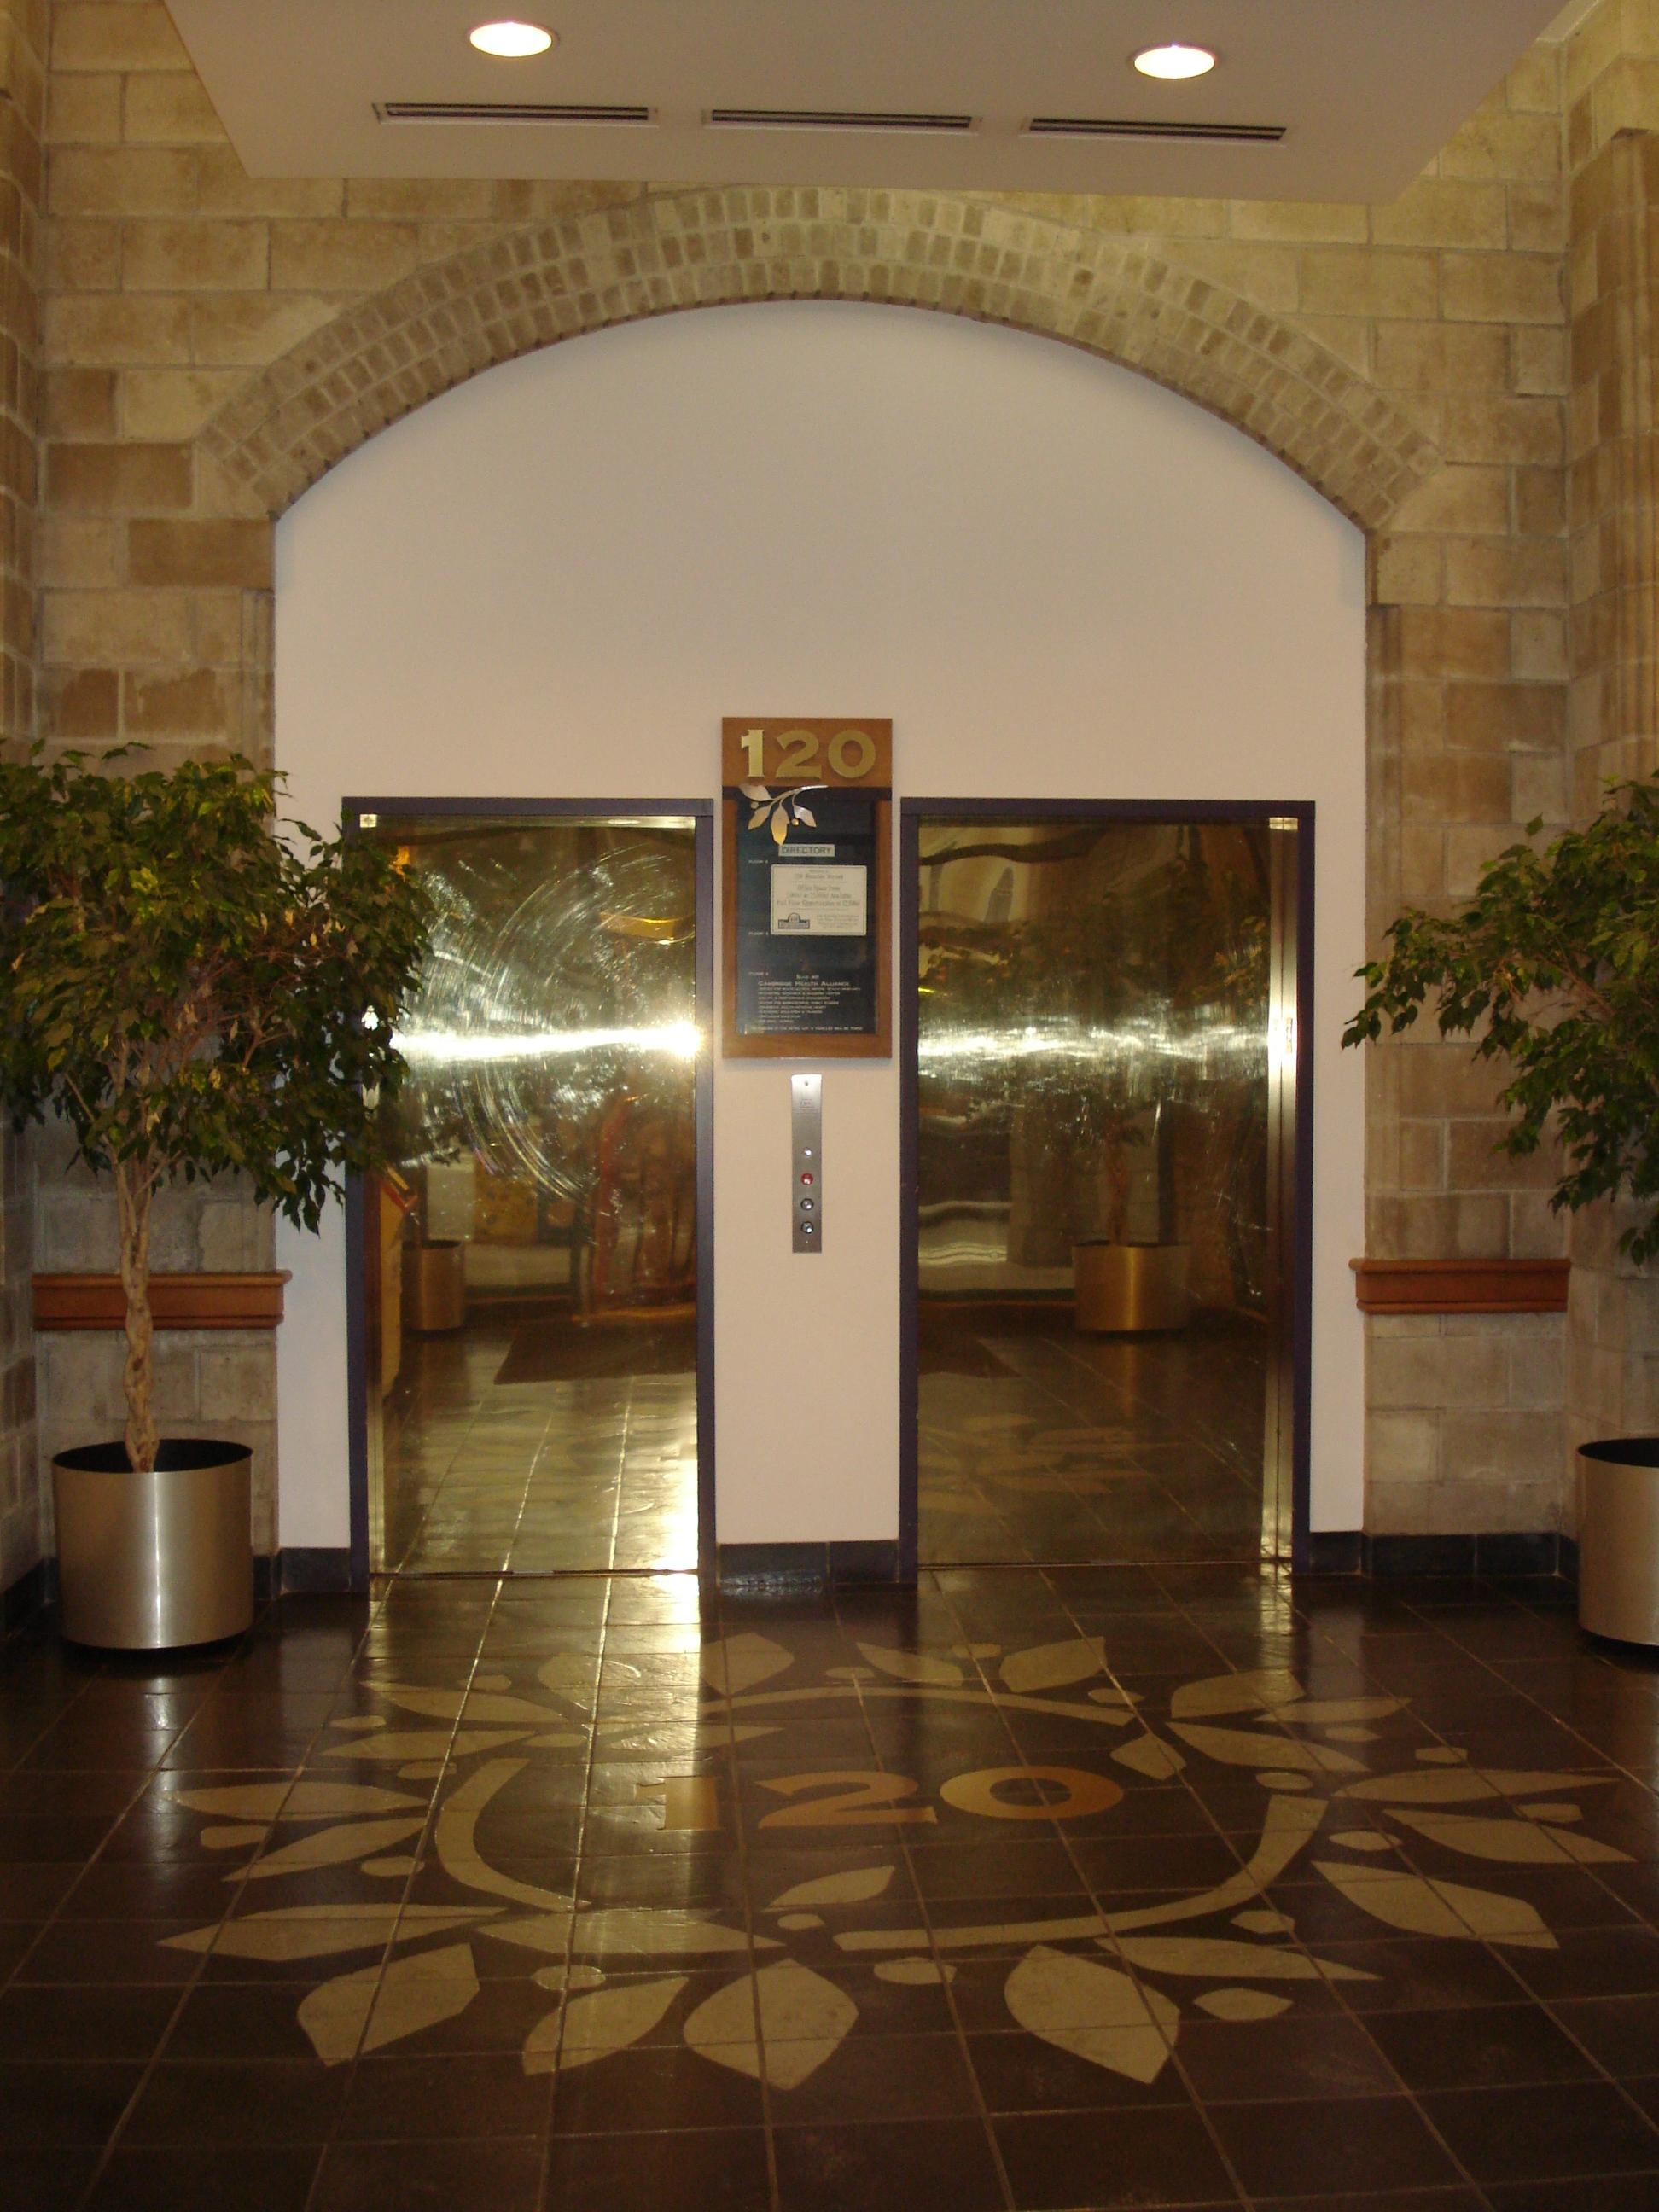 120 Bcn Lobby 2.JPG